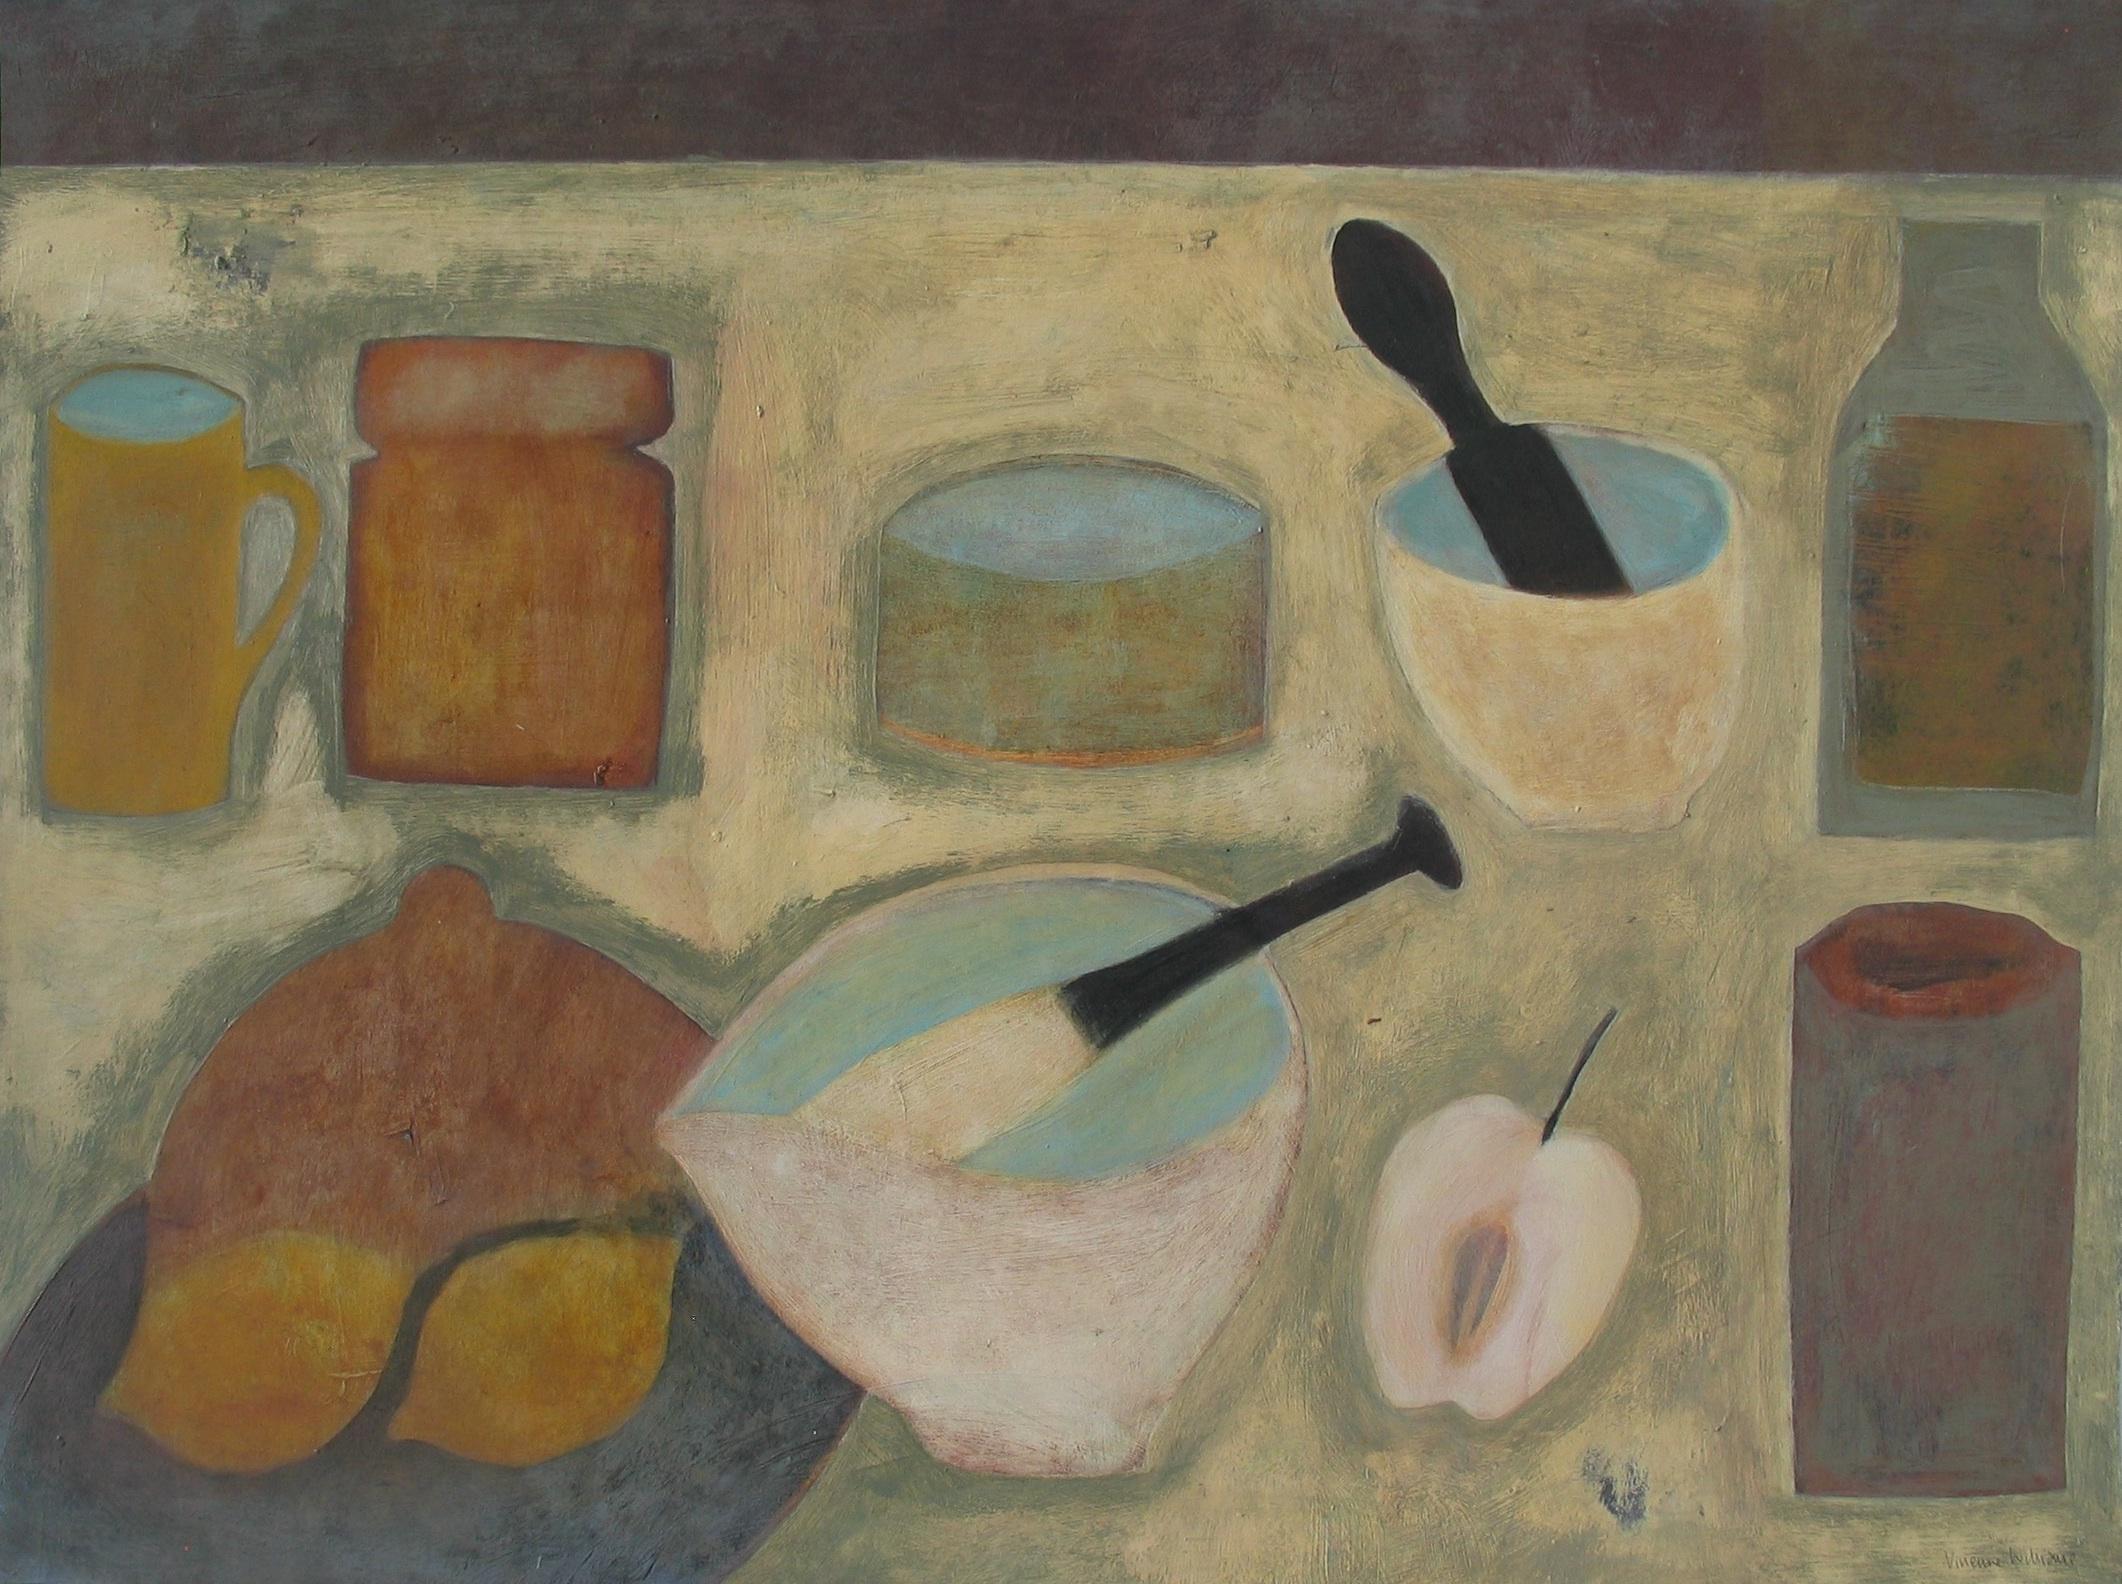 Cornish Kitchen, 46cm x 61cm, 2007